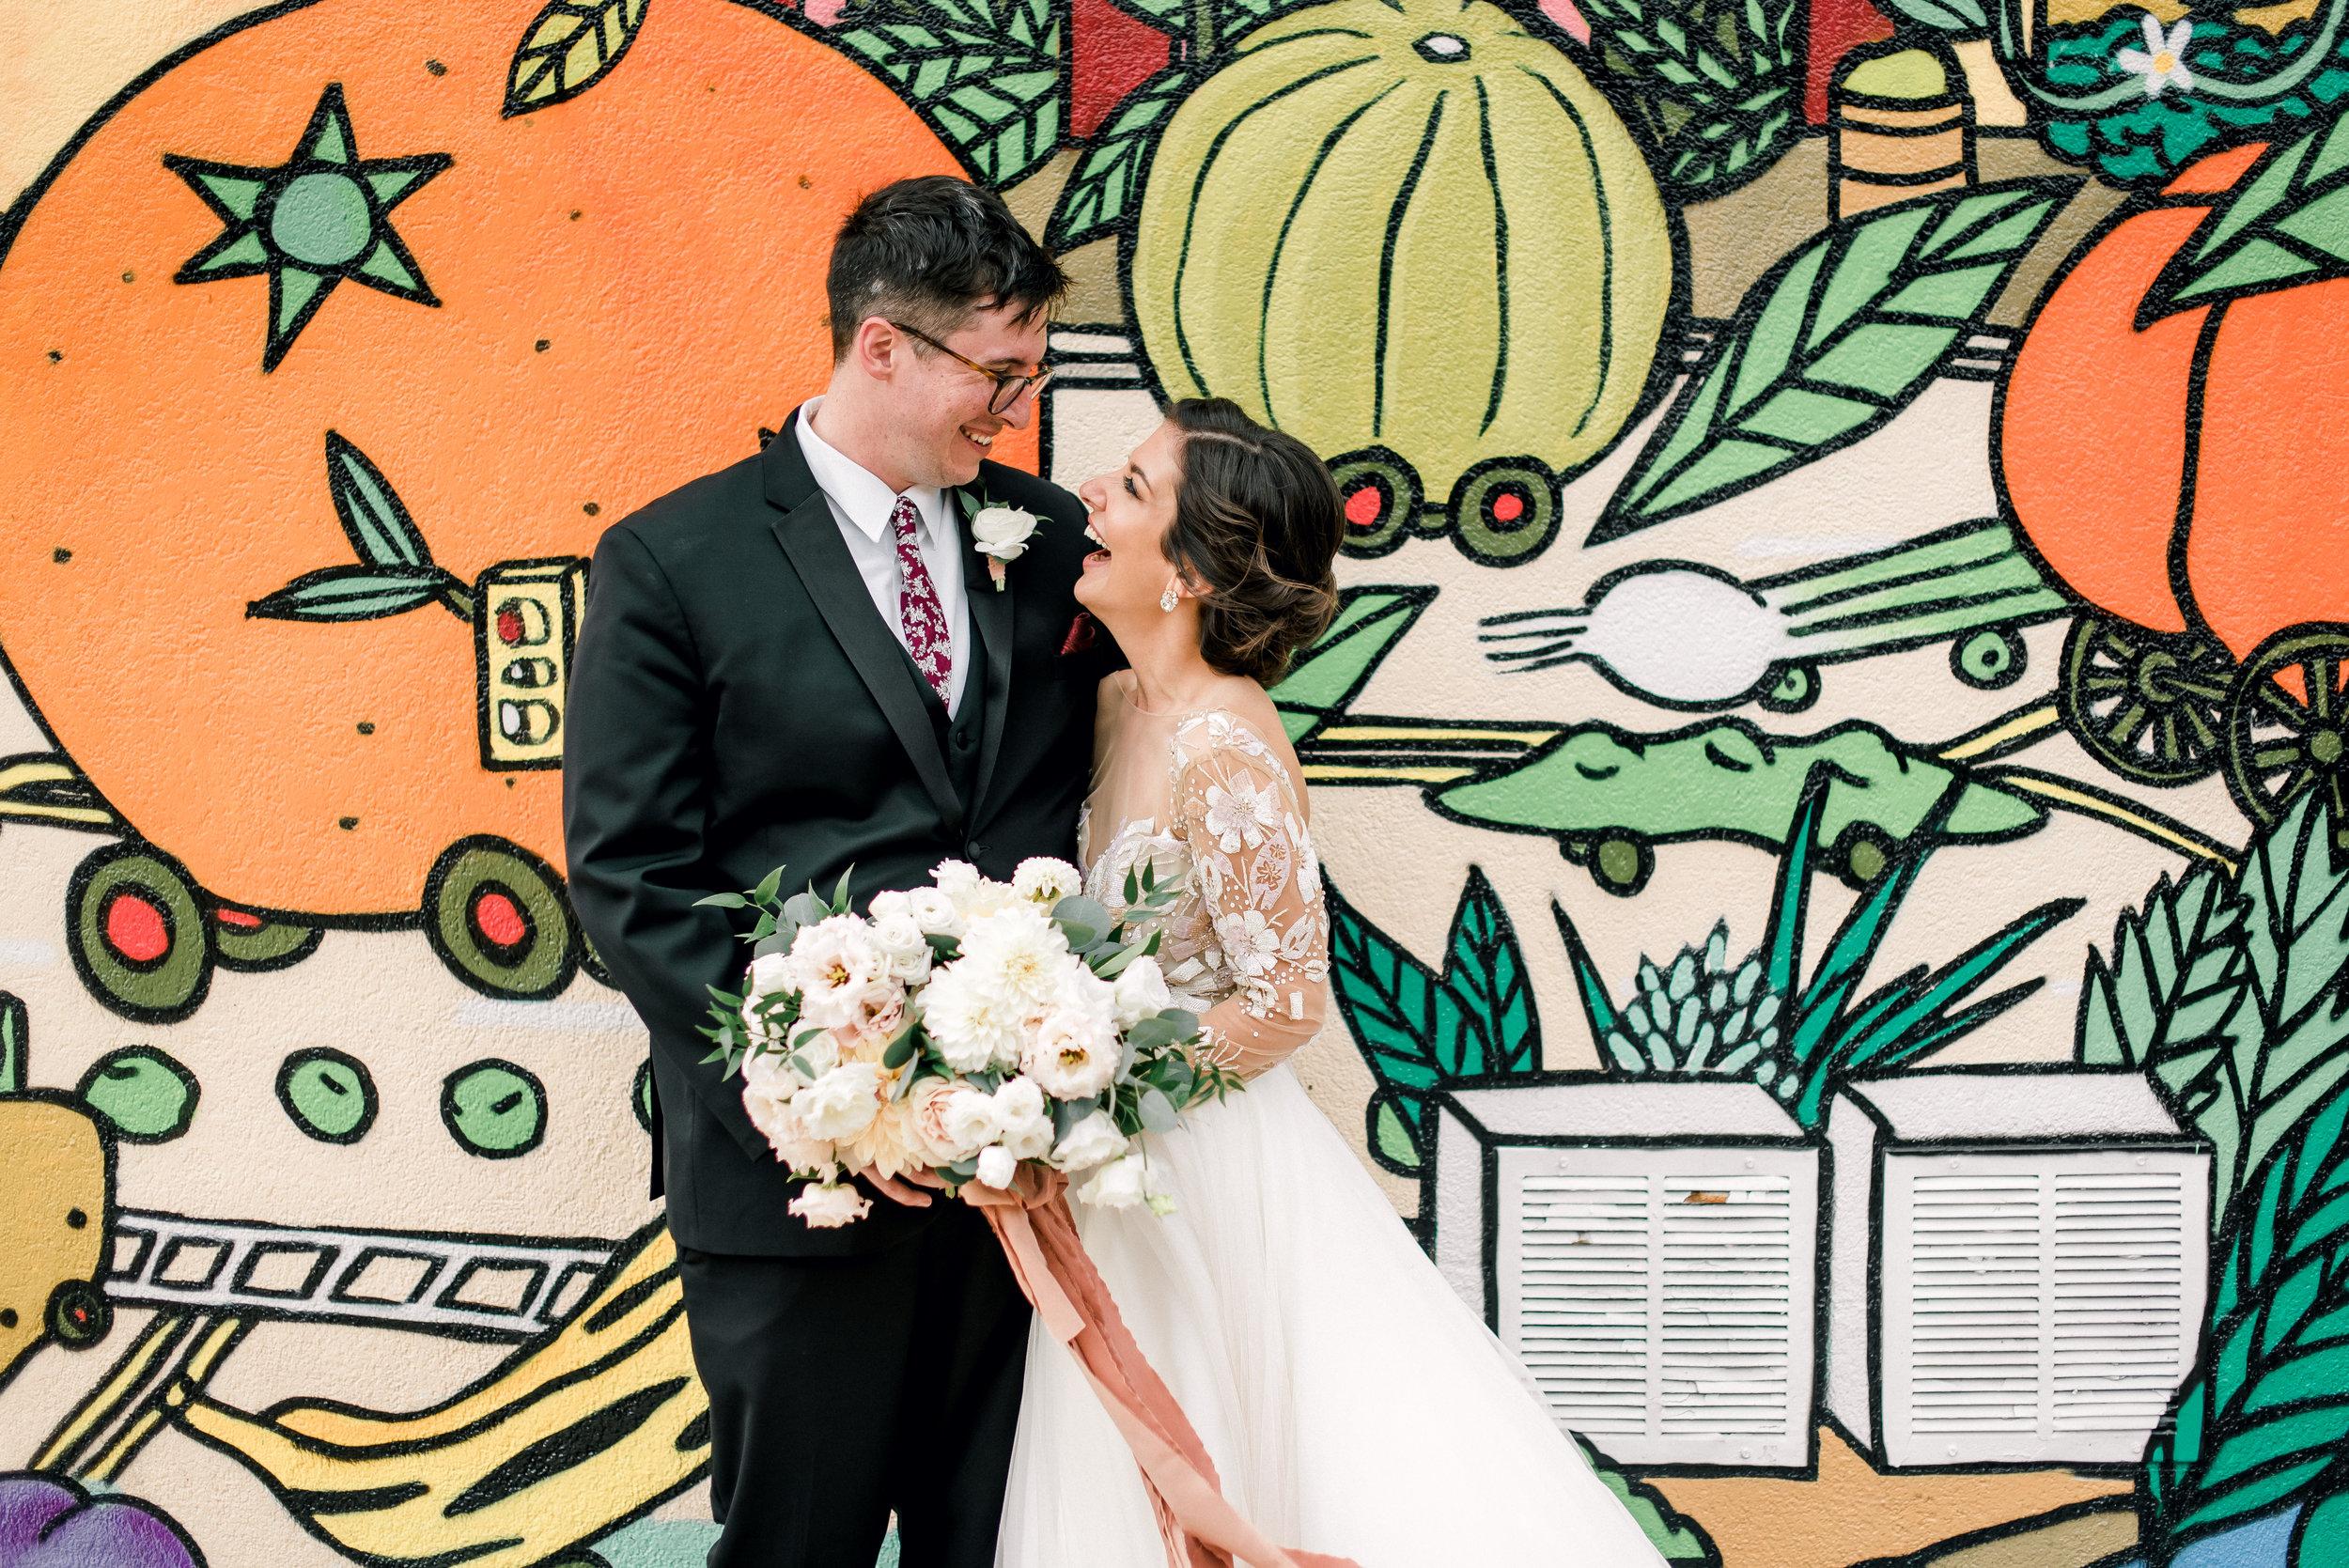 cleveland-wedding-photographer-great-lakes-brewing-arcade-0050.jpg